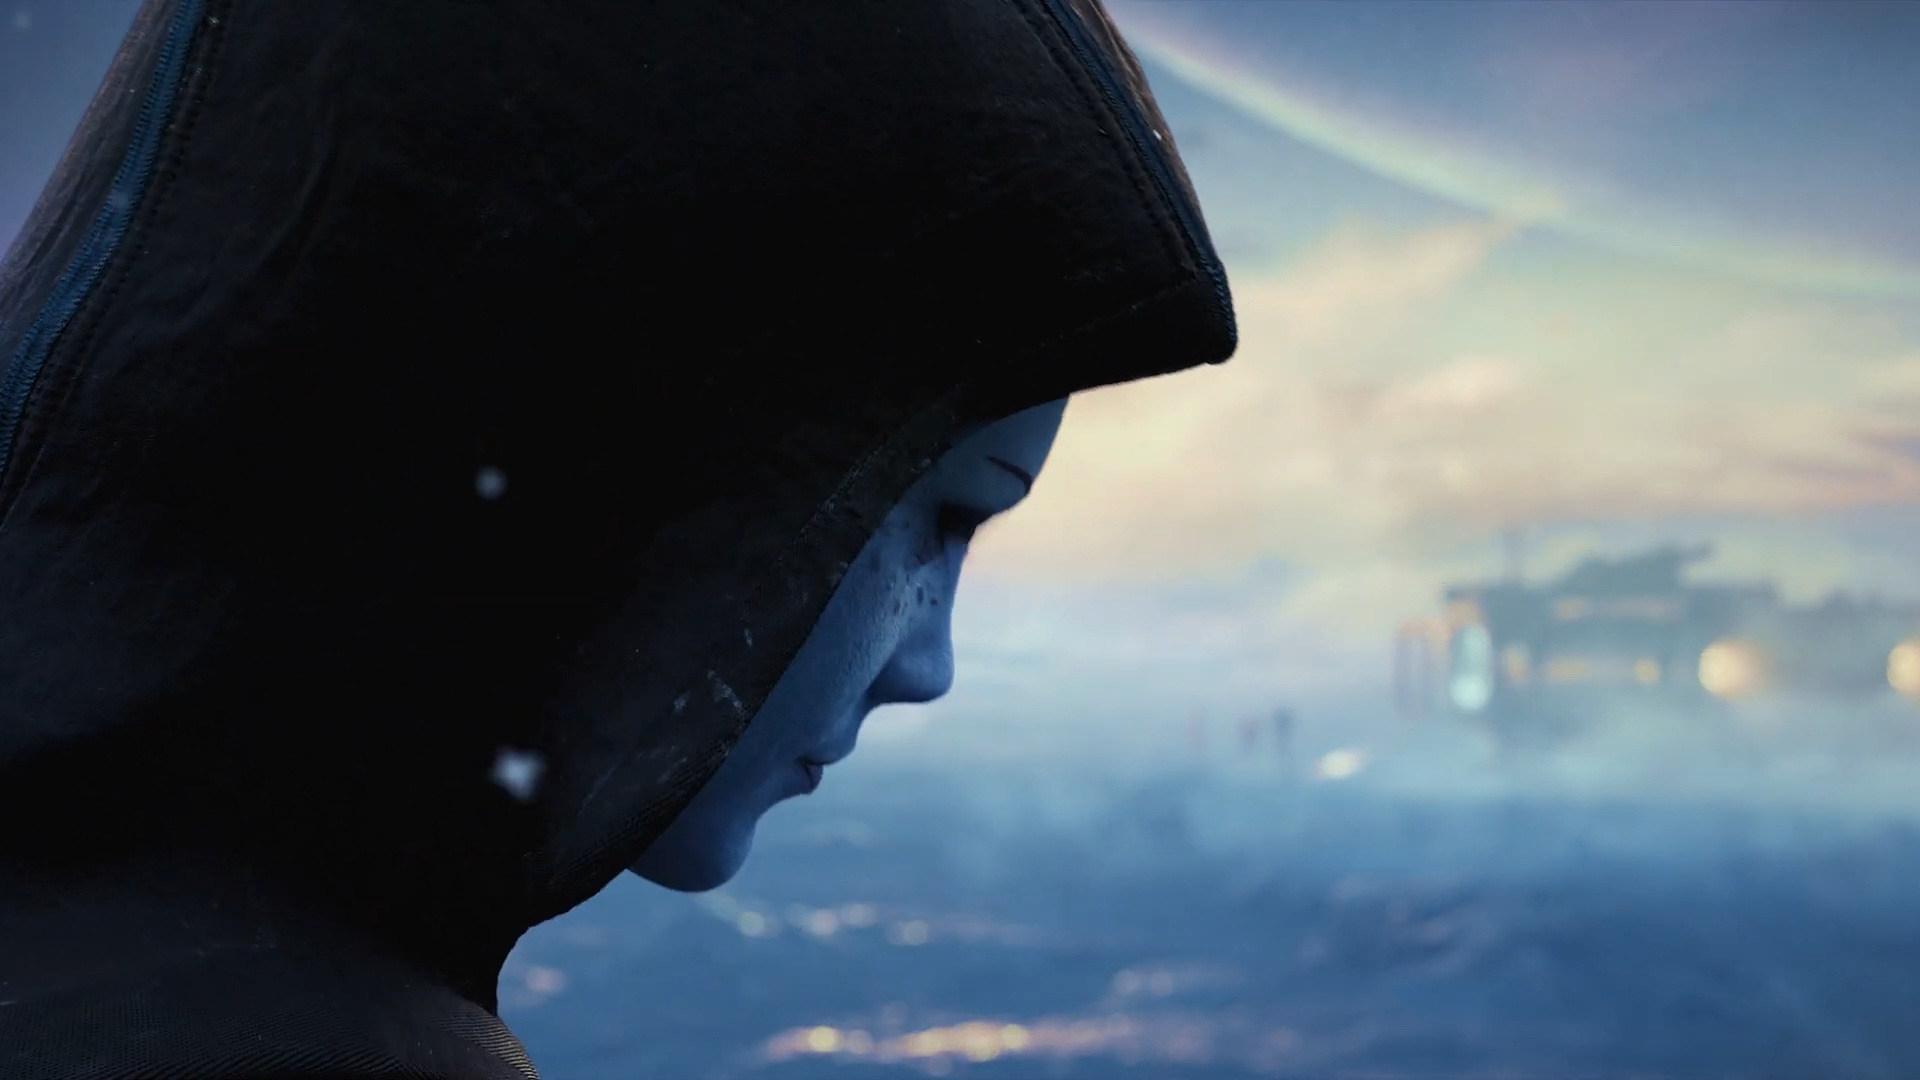 Trailer, Electronic Arts, Ea, Teaser, BioWare, Mass Effect, Game Awards 2020, Mass Effect 5